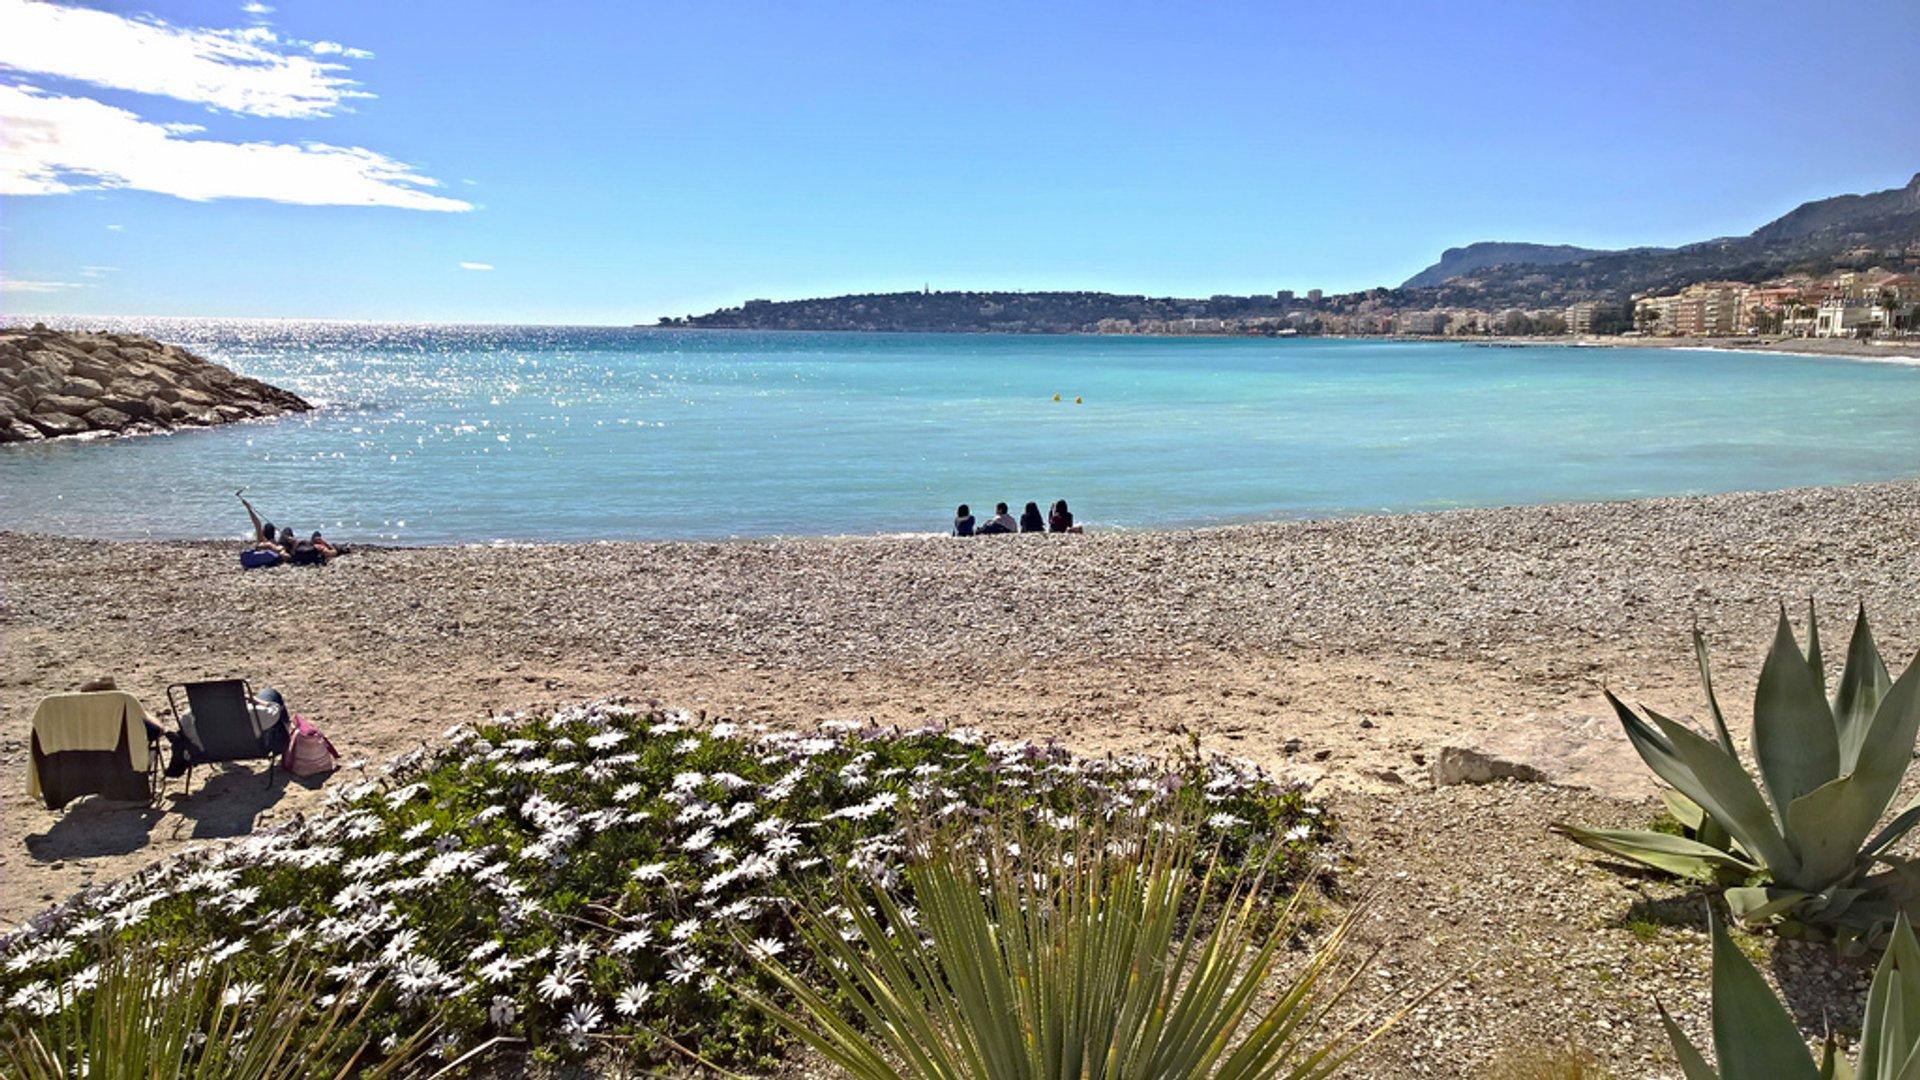 Beach in Menton 2020